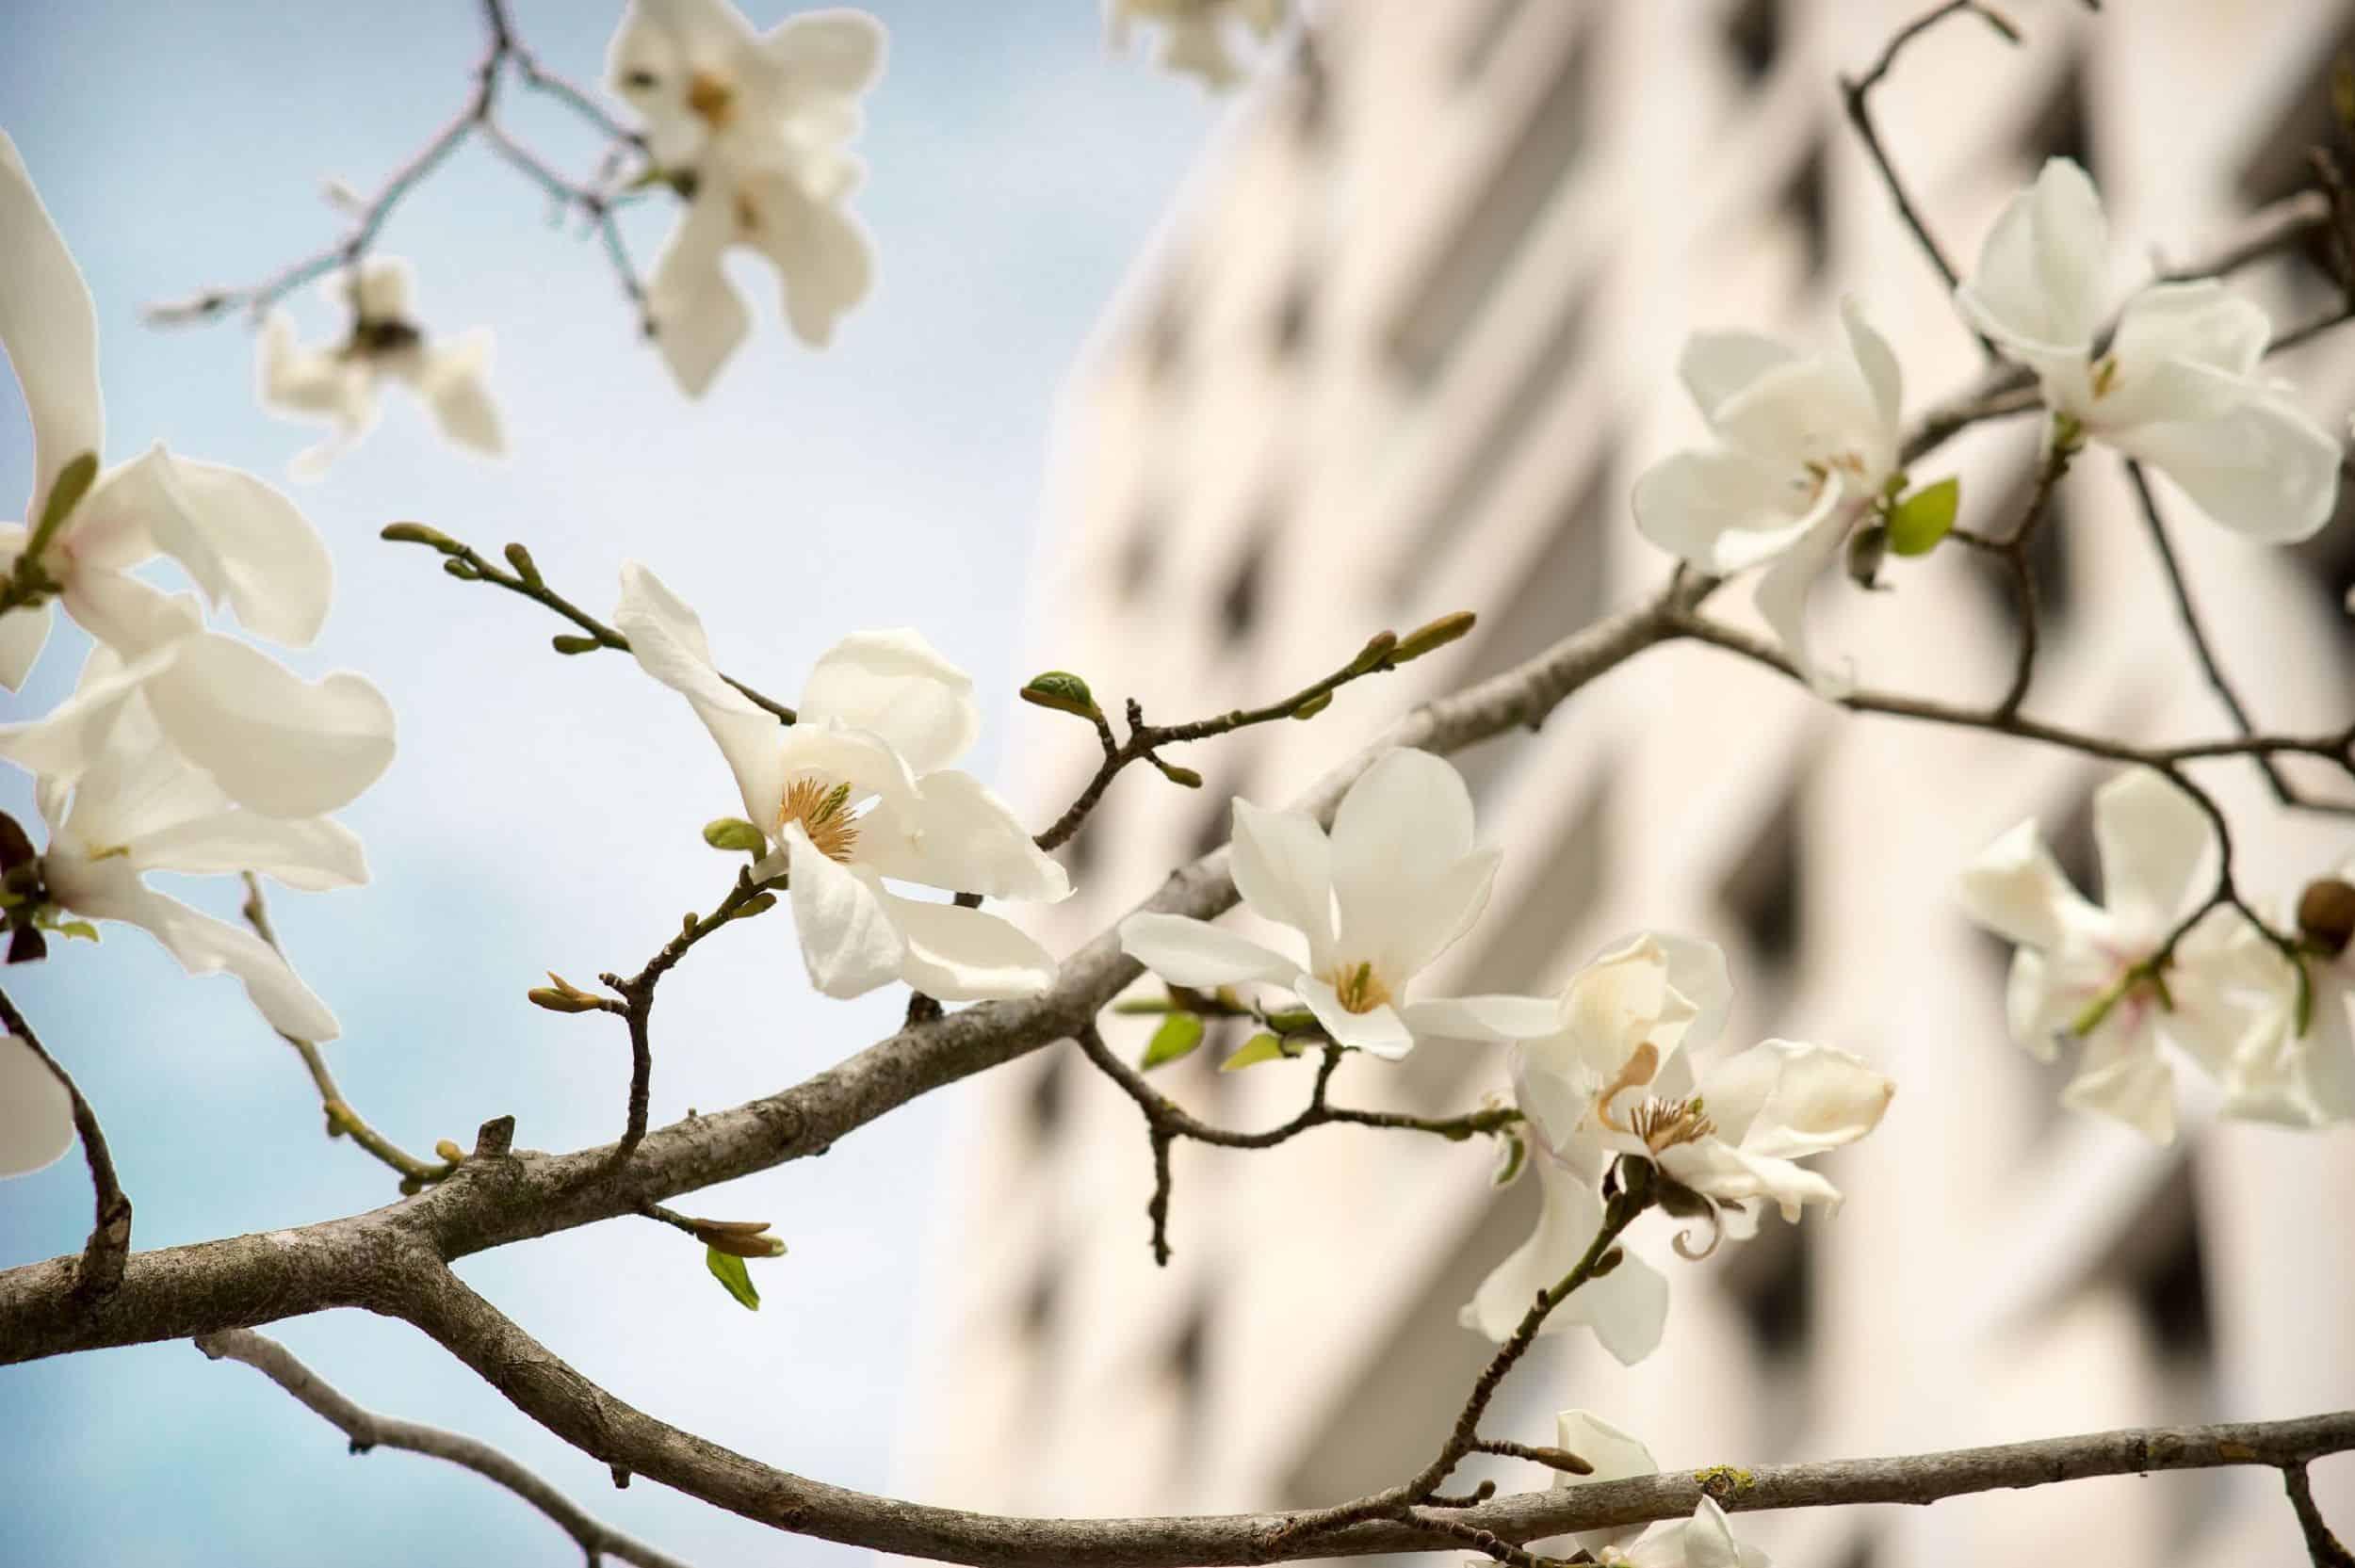 Bild: Magnolienblüte in der Gasse, Foto: ver.de landschaftsarchitektur